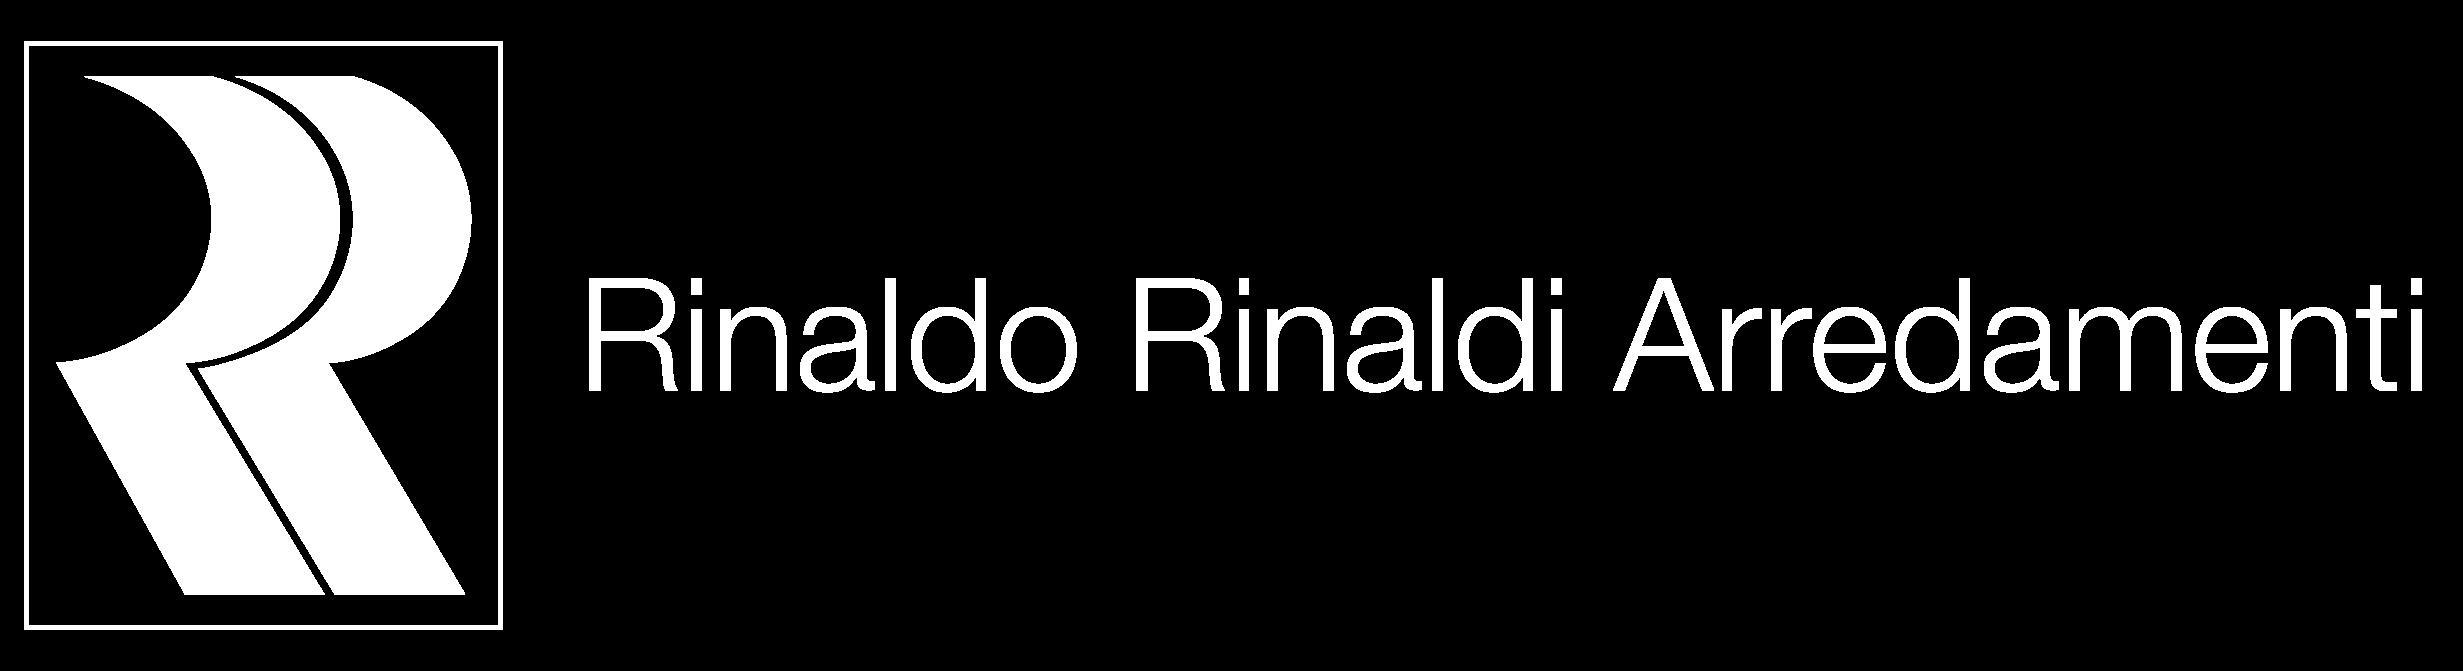 Rinaldo Rinaldi